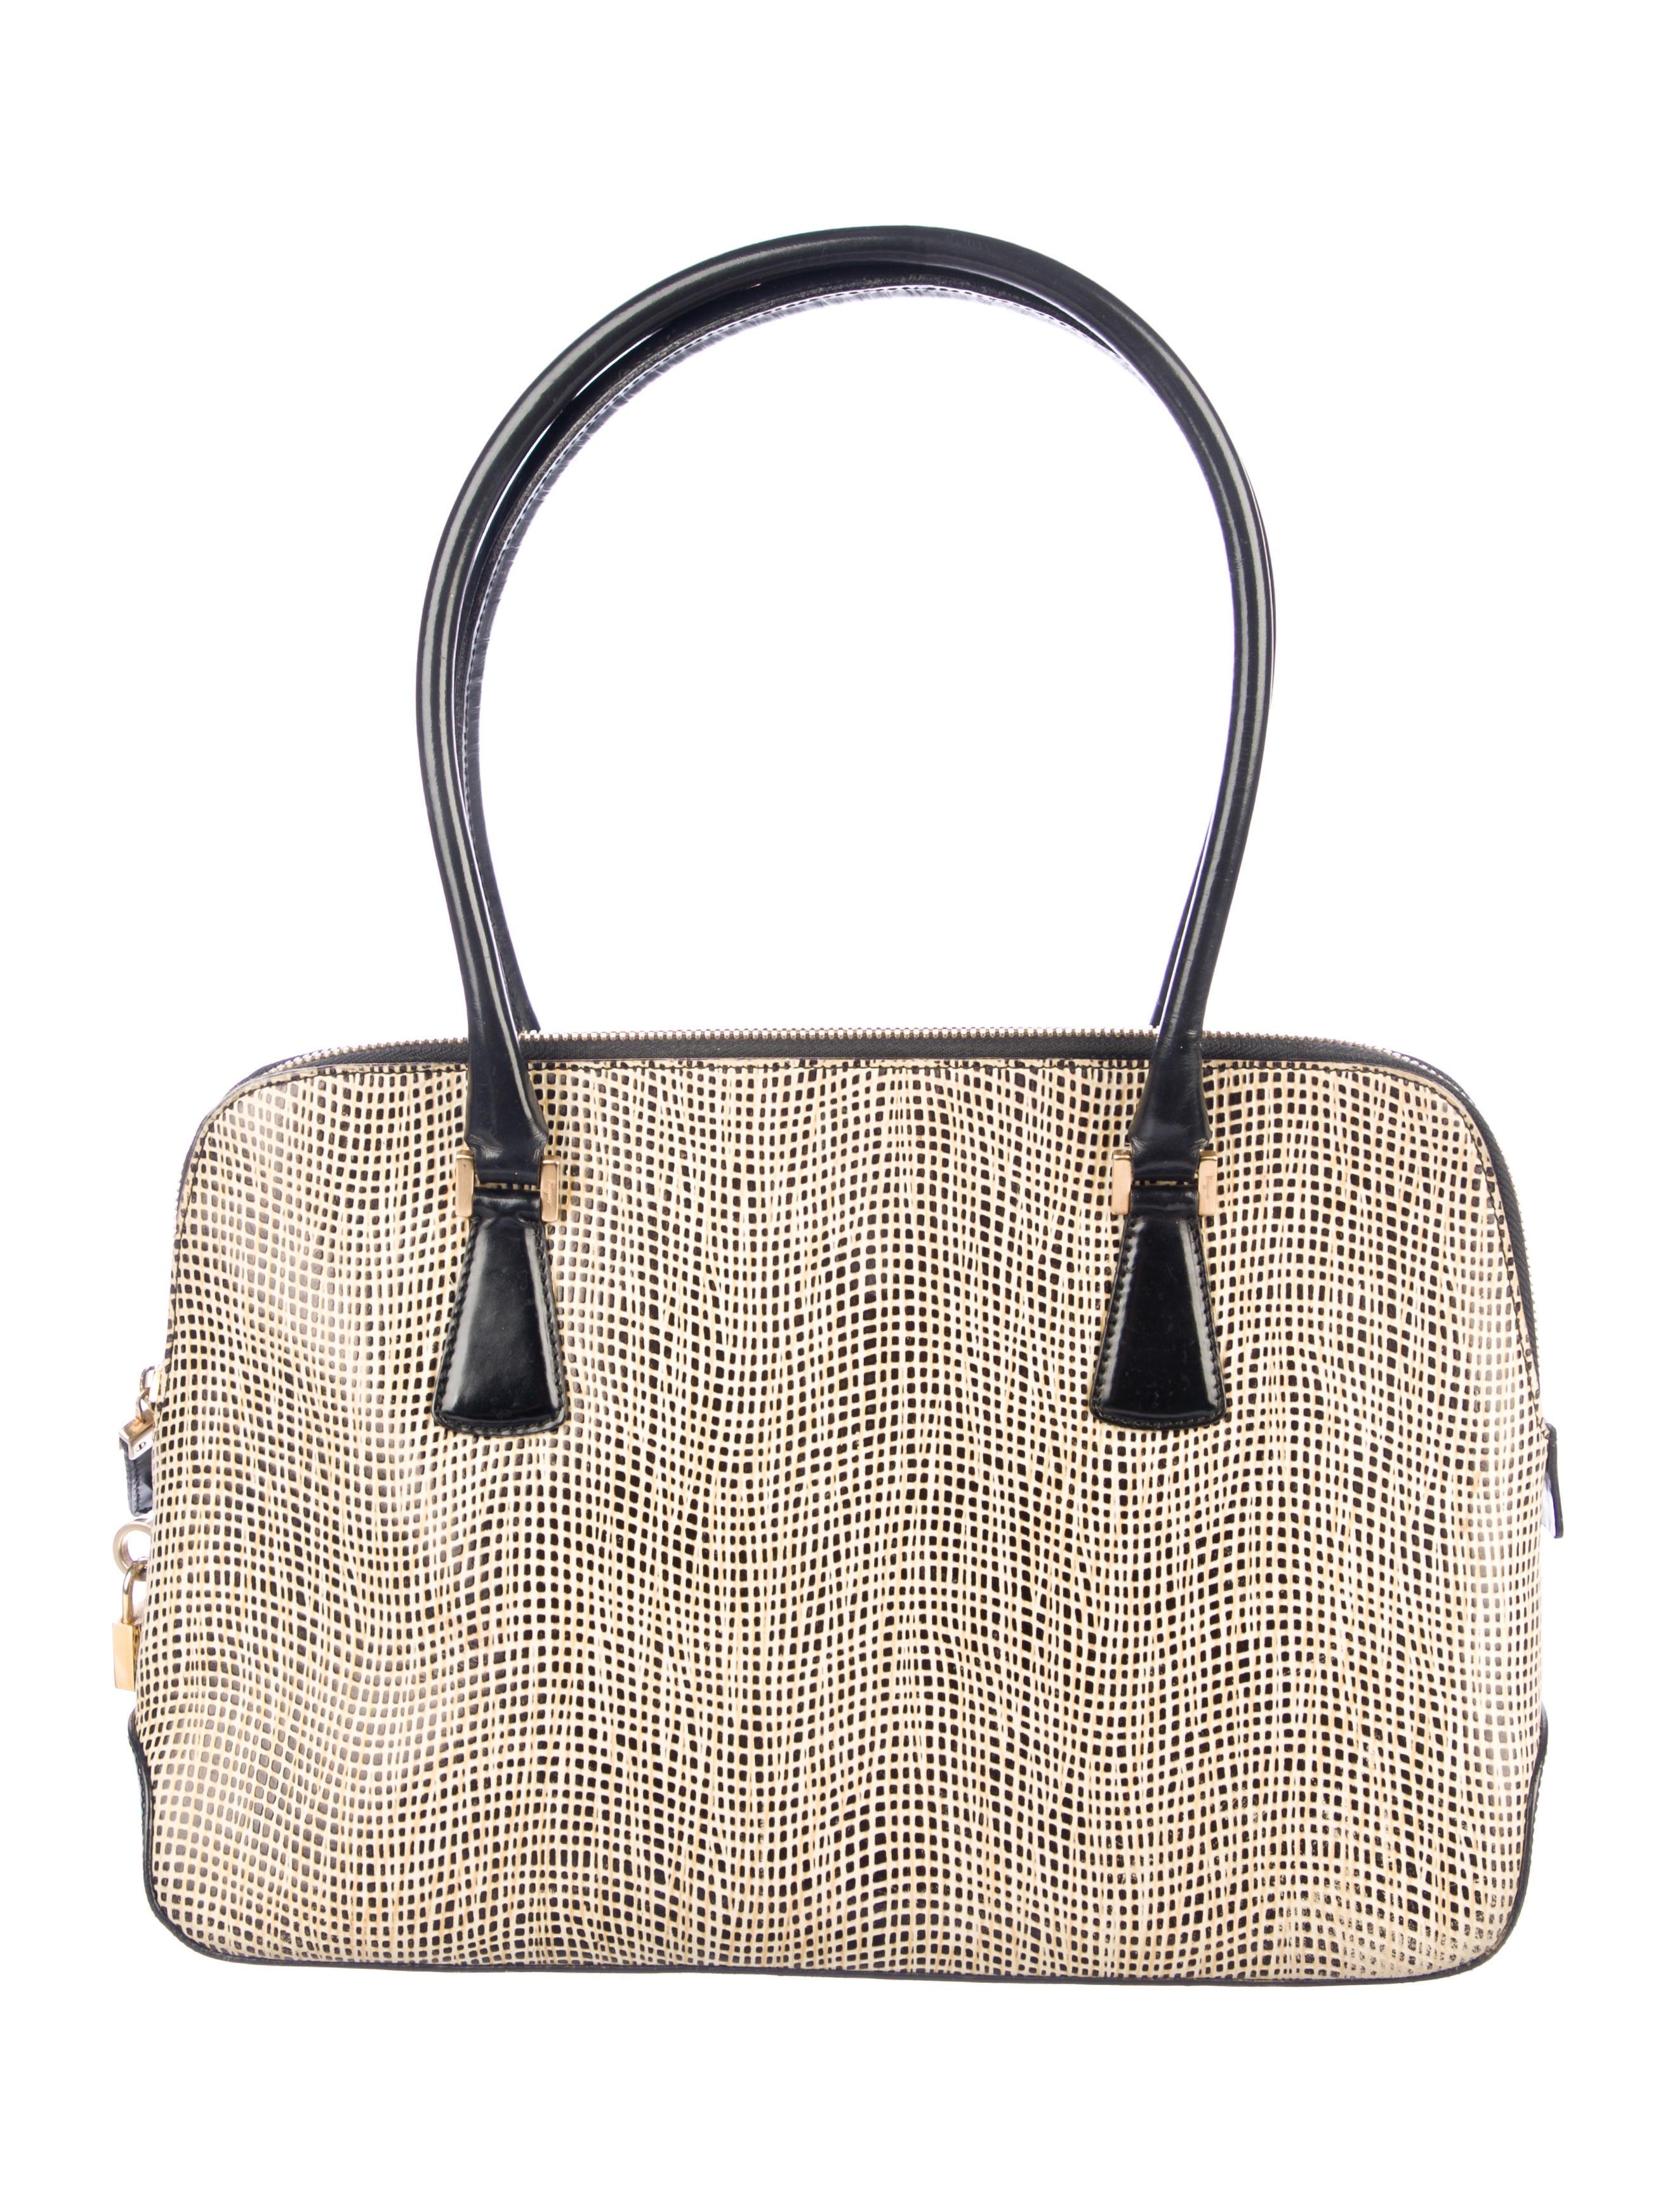 Salvatore Ferragamo Embossed Leather Shoulder Bag - Handbags ... 21f6a49574816